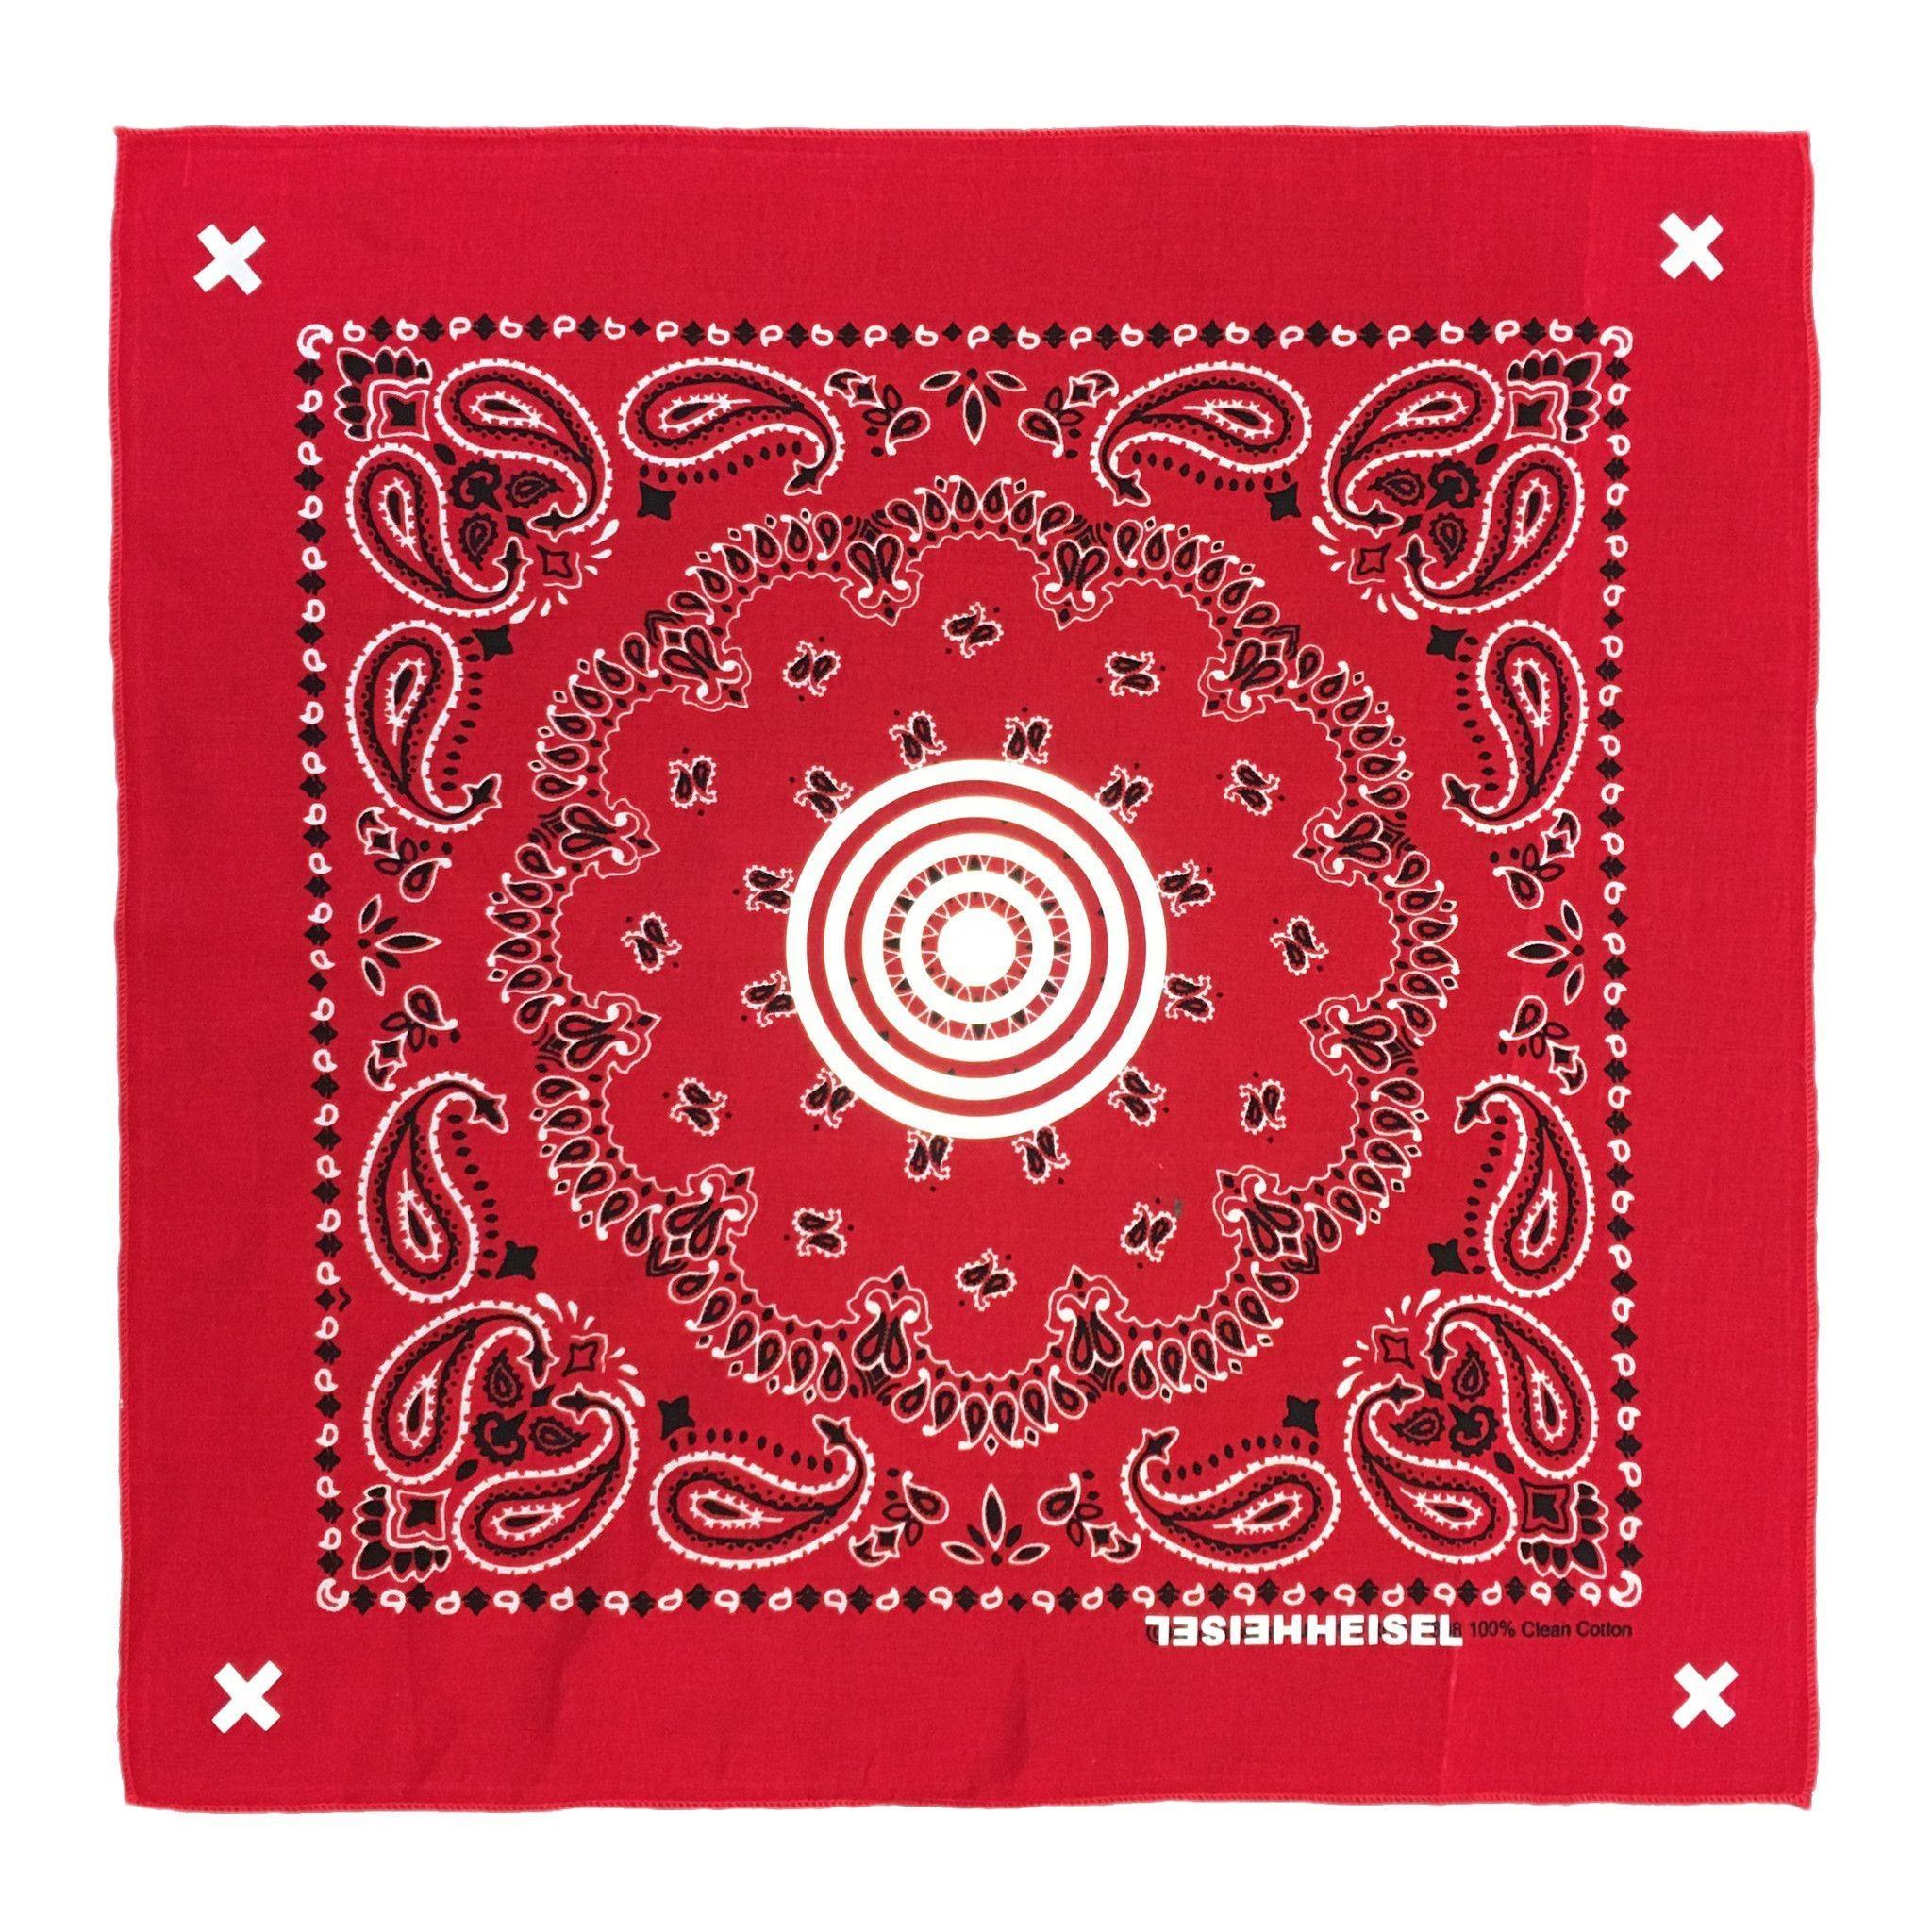 Res: 2048x2048, reflective paisley bandana